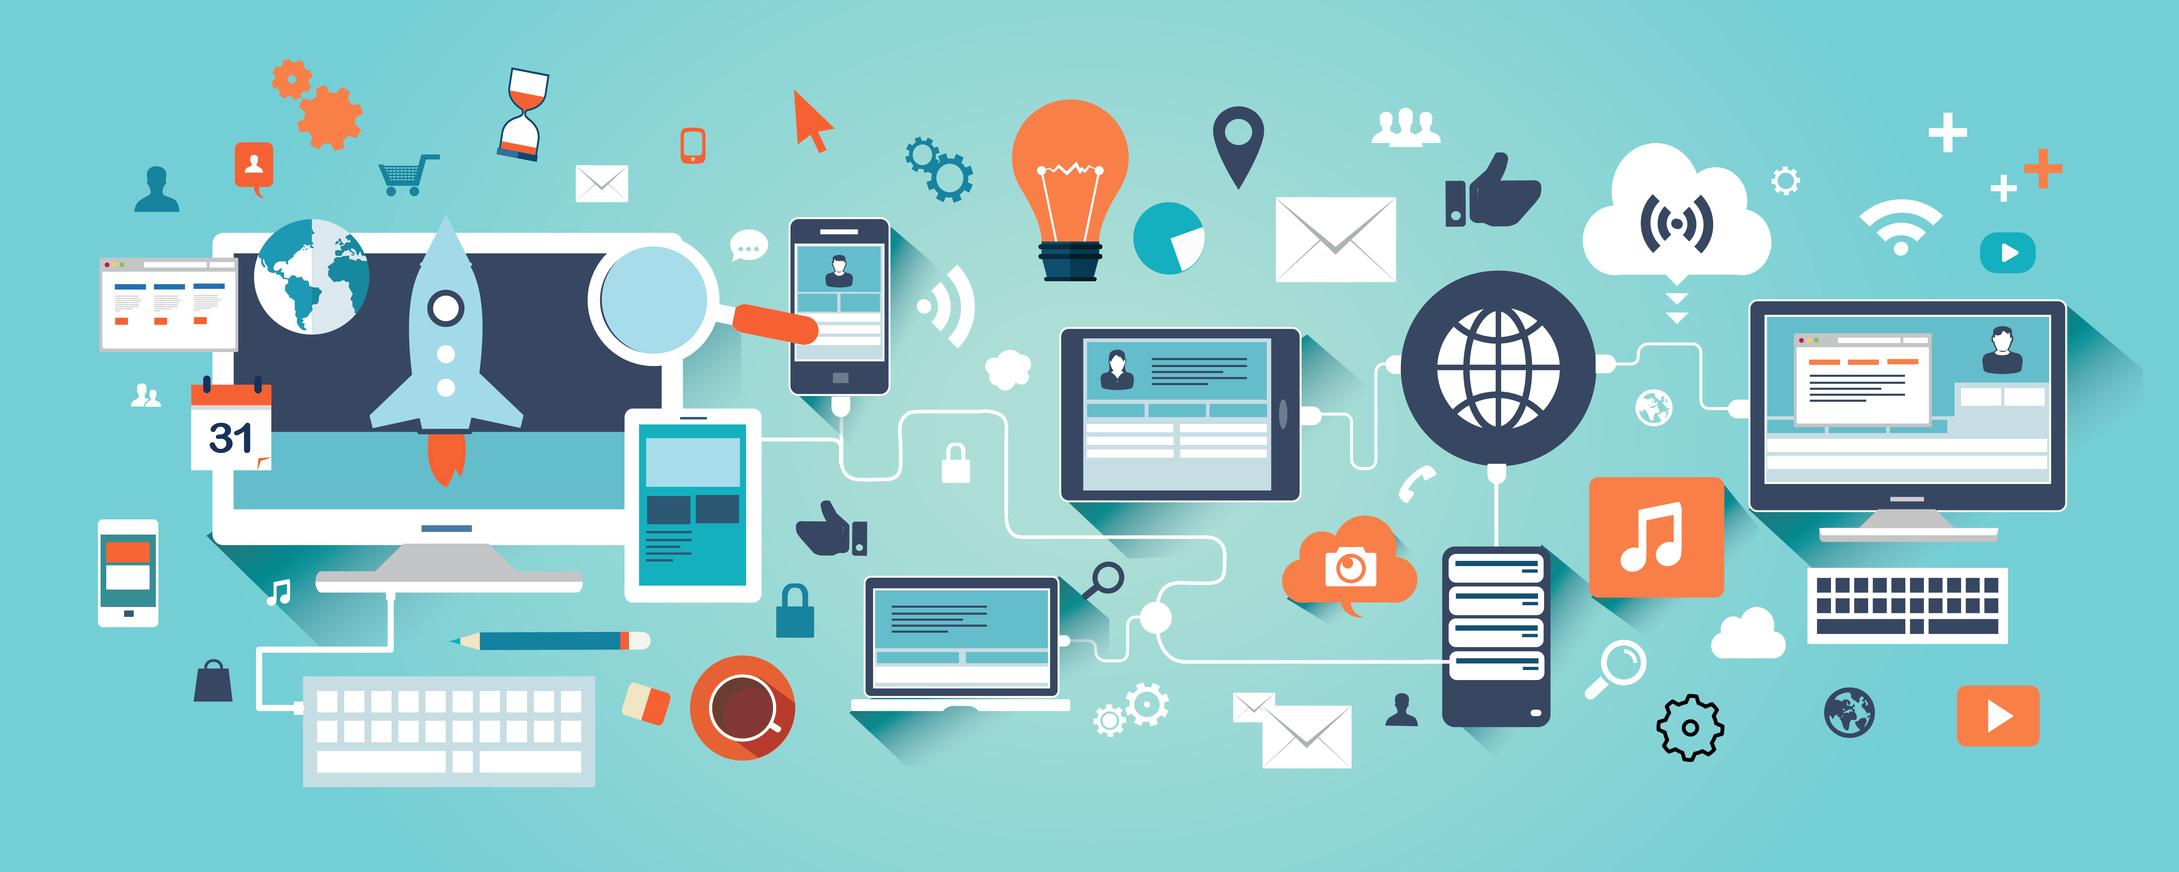 Diseño | Marketing digital | Negocios | Internet